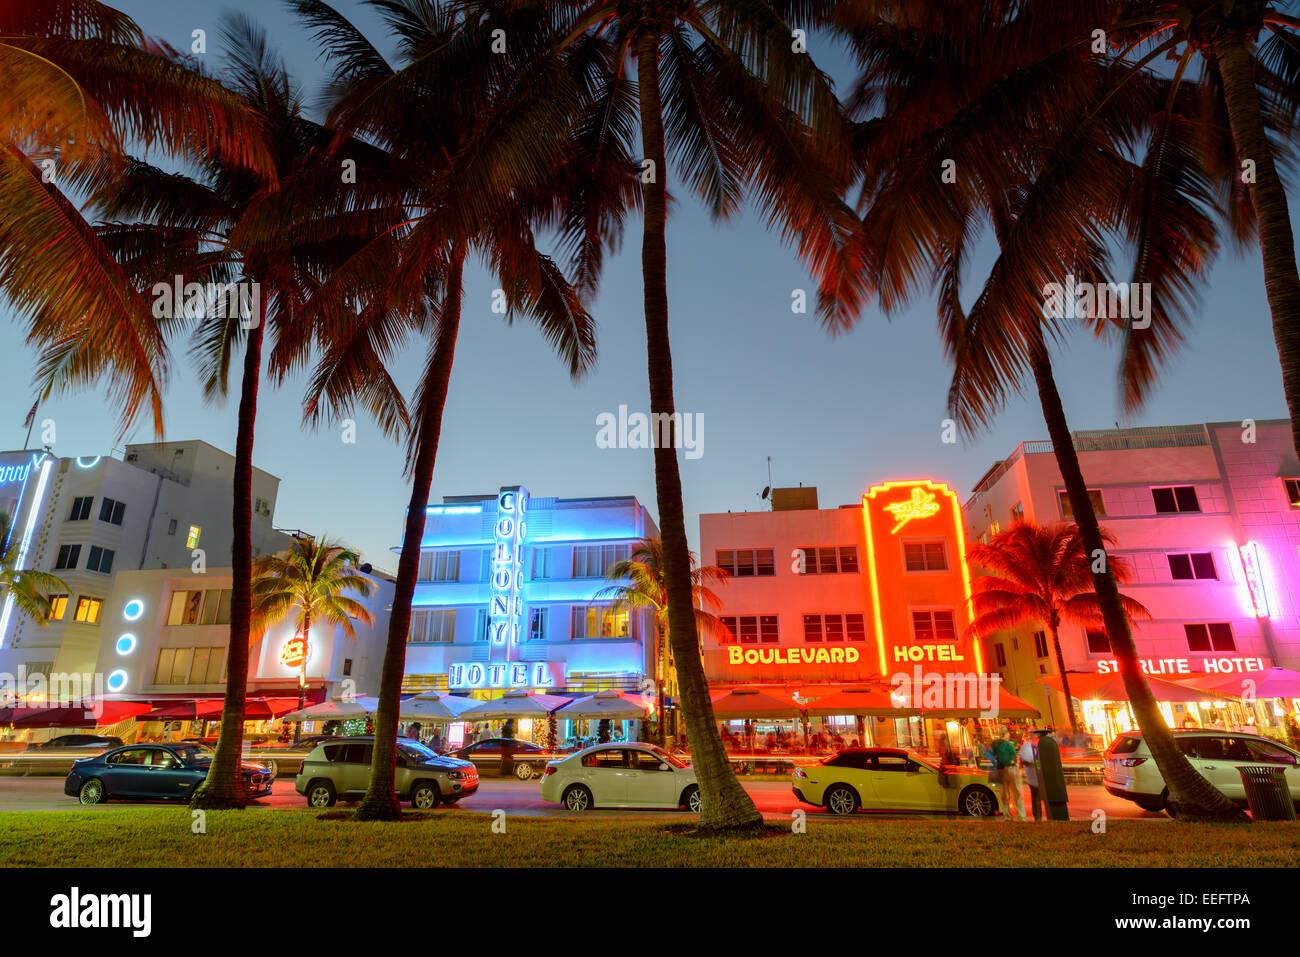 Art Deco Hotels on Ocean Drive at Dusk, South Beach, Miami, Florida, USA - Stock Image